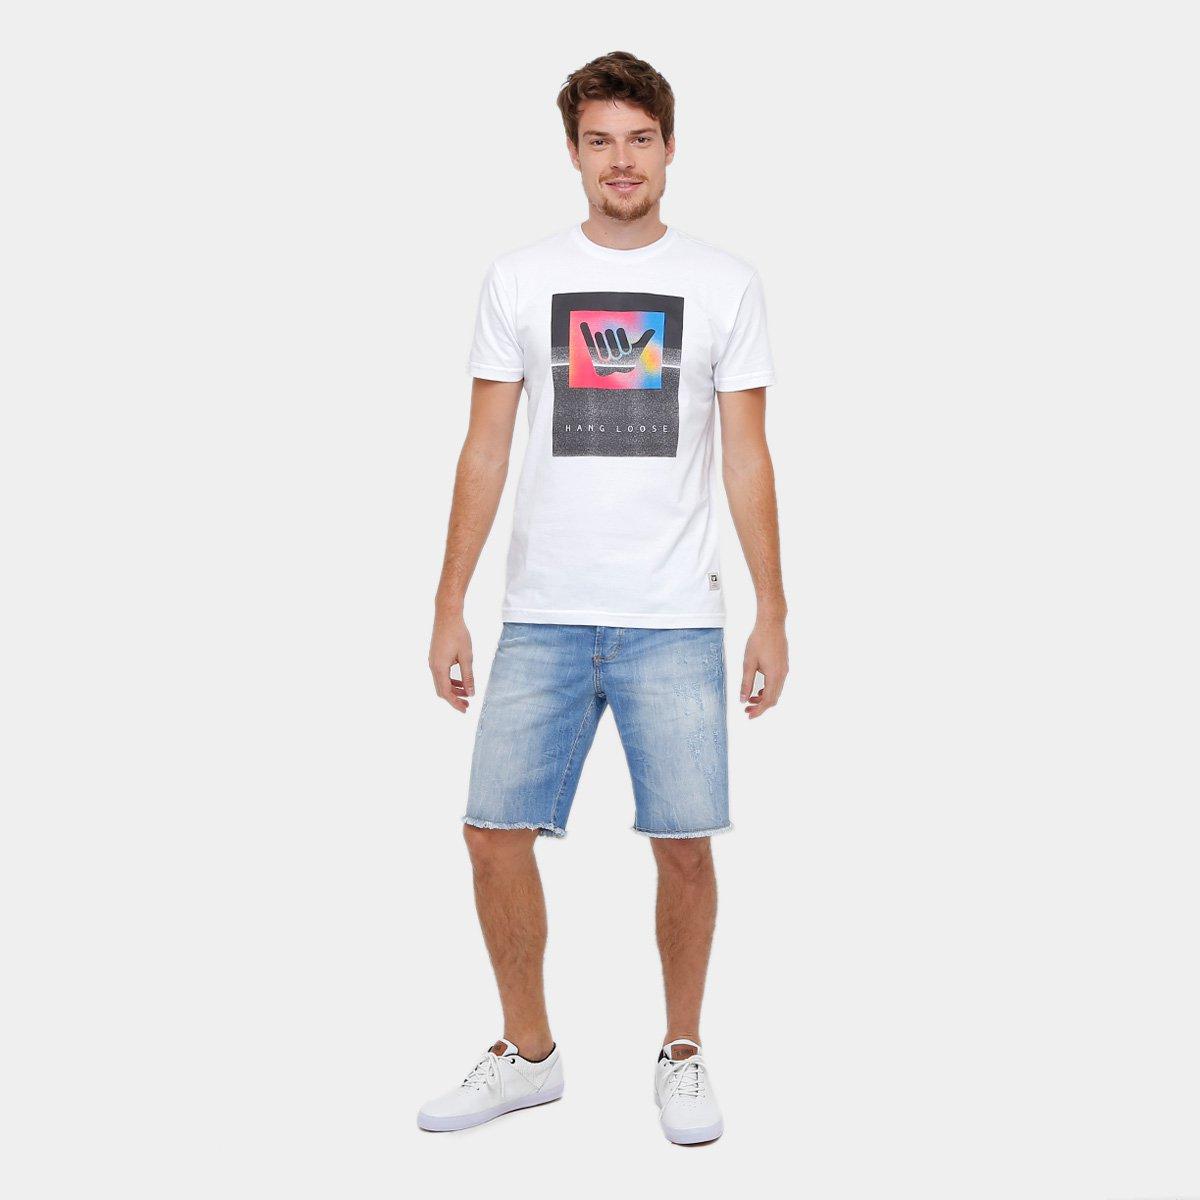 Camiseta Hang Loose Silk Shakabow Masculina - Compre Agora  526d73119b4cf